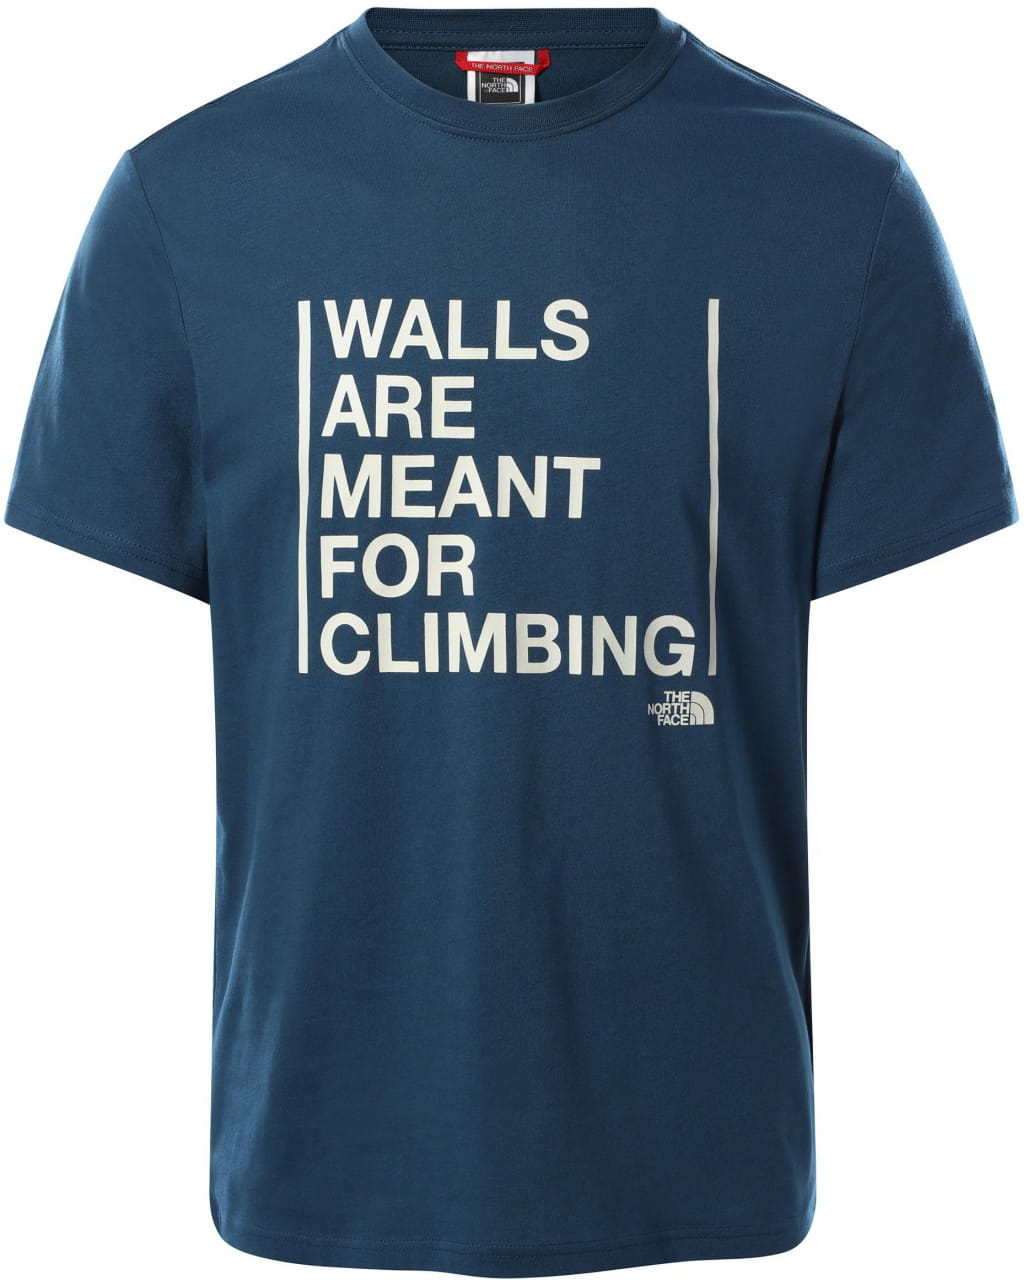 Pánské lezecké tričko The North Face Men's S/S Walls Are For Climbing Tee